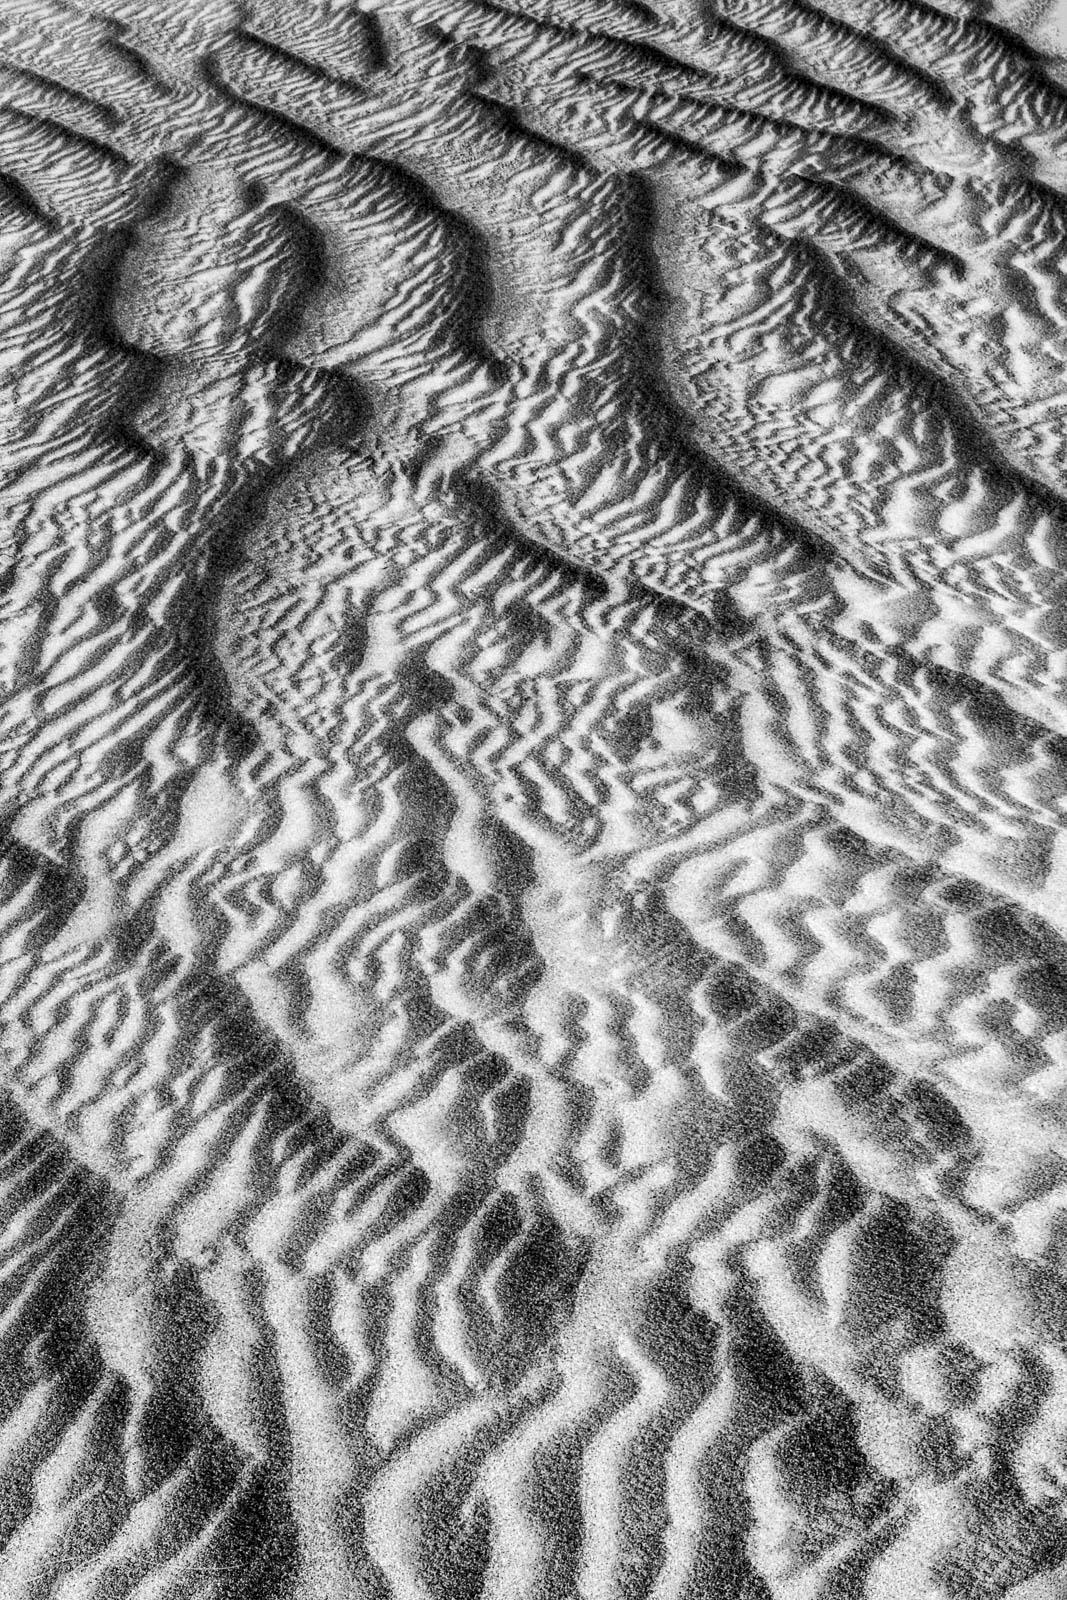 Sand patterns resemble aerial badlands on the desert floor.